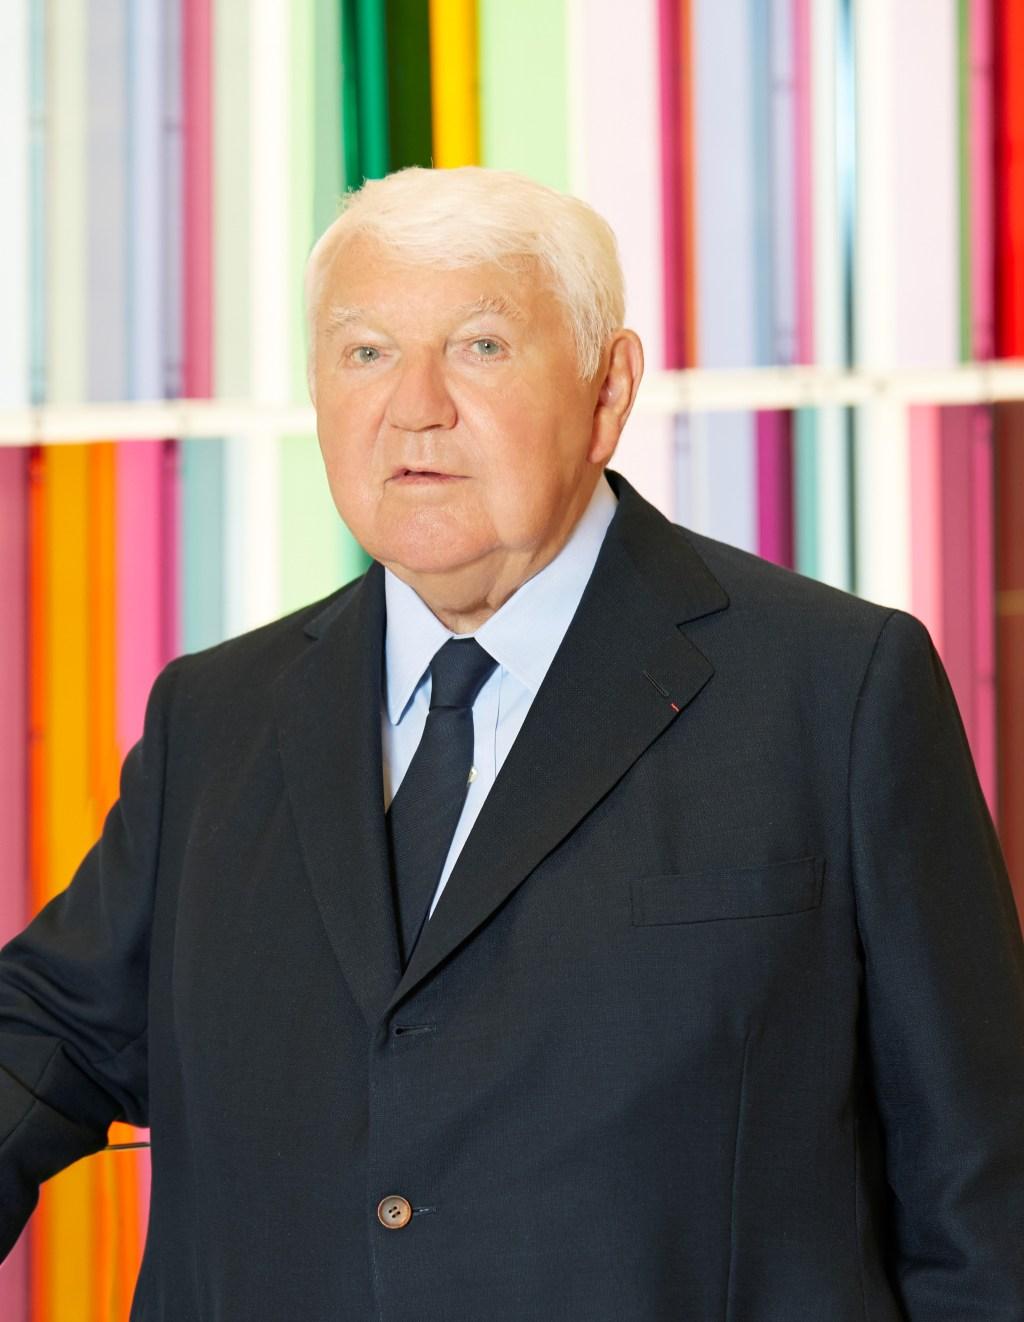 Philippe Cassegrain